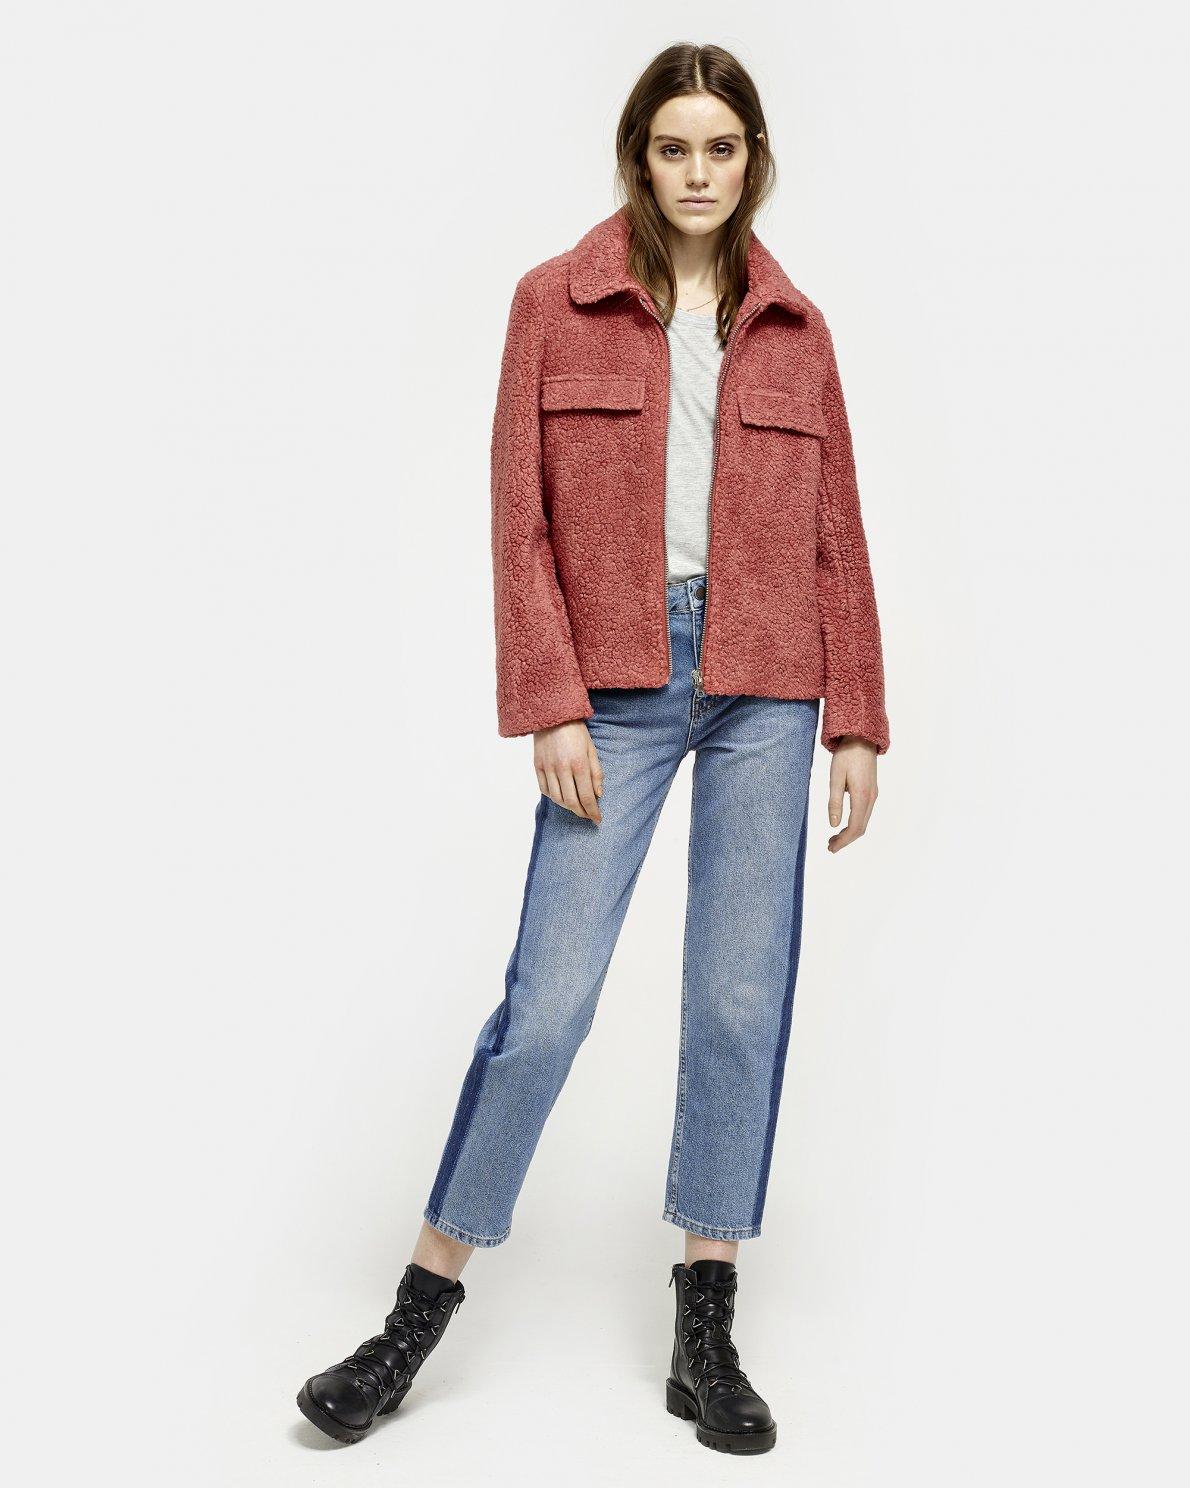 0493ef823ae OUTLET Clothing - Moss Copenhagen - Alira Teddy Jacket